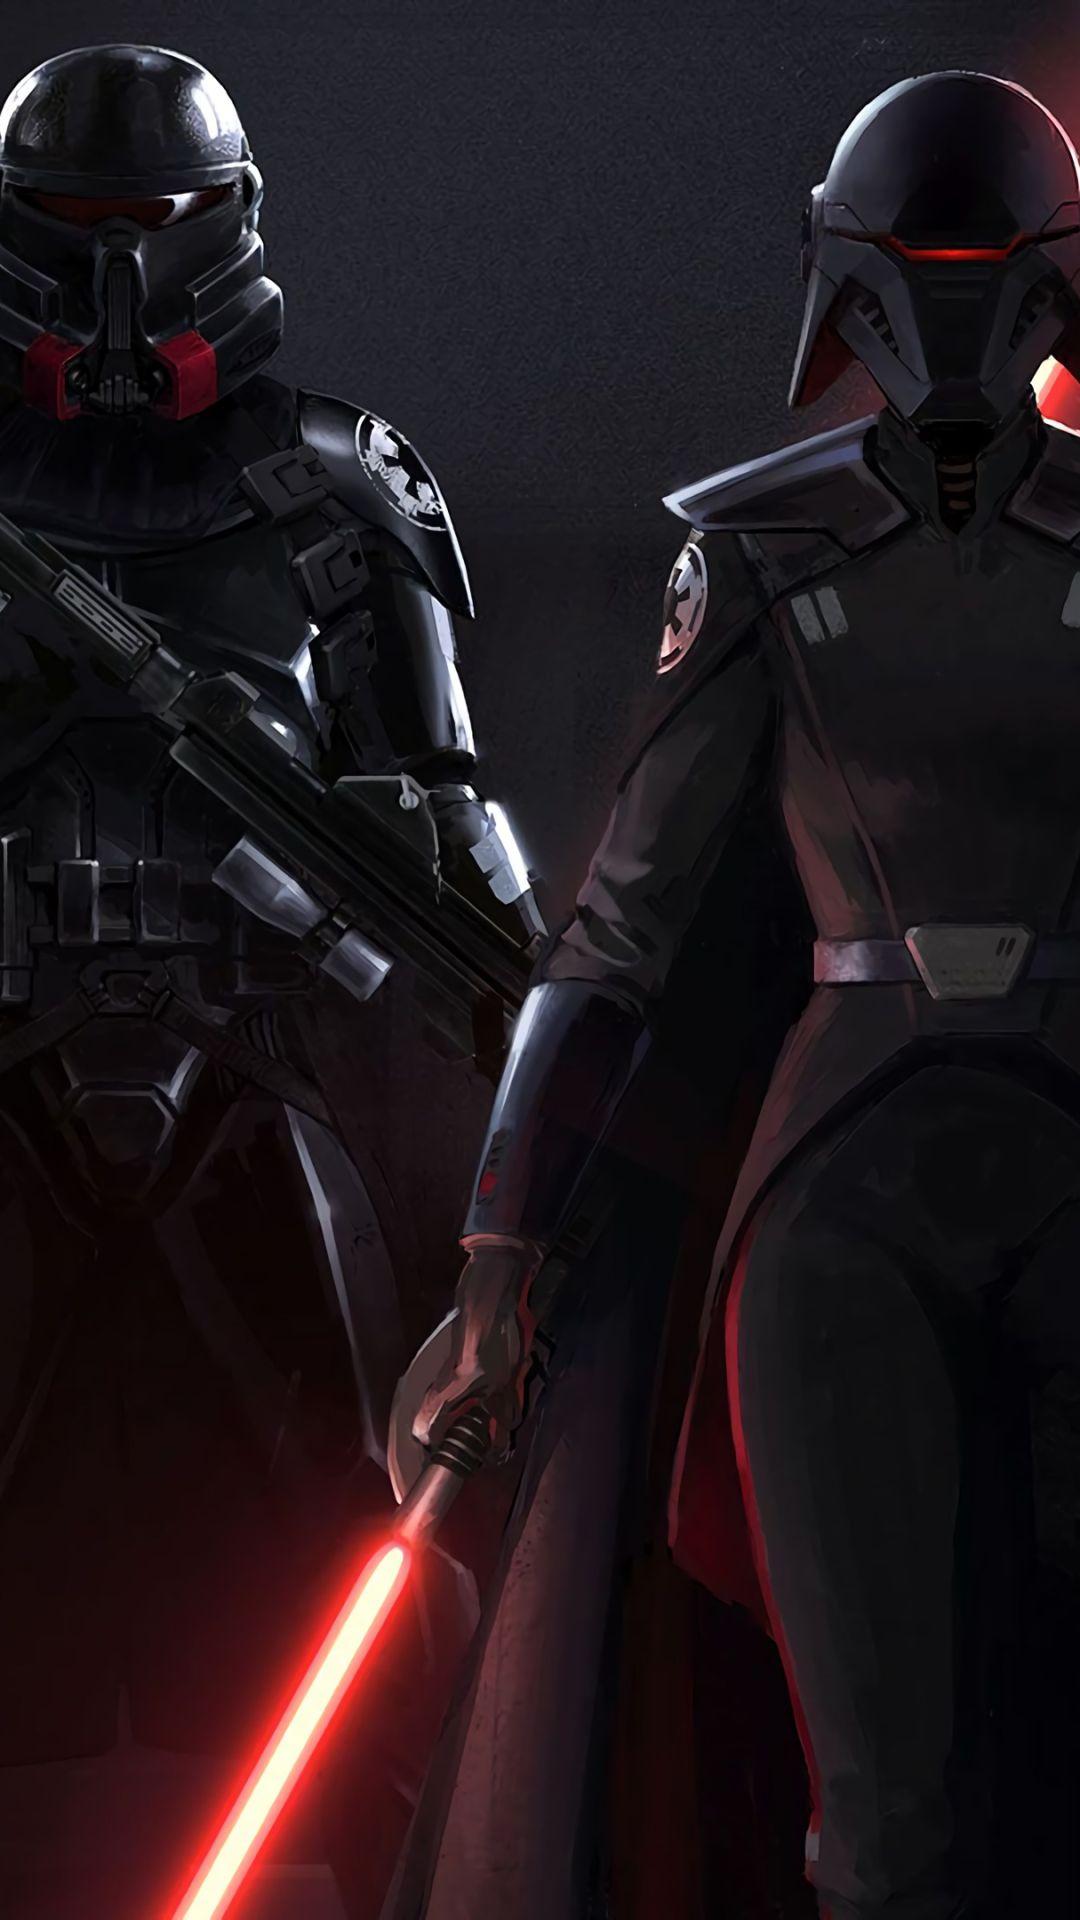 Download this Wallpaper Video Game/Star Wars Jedi Fallen